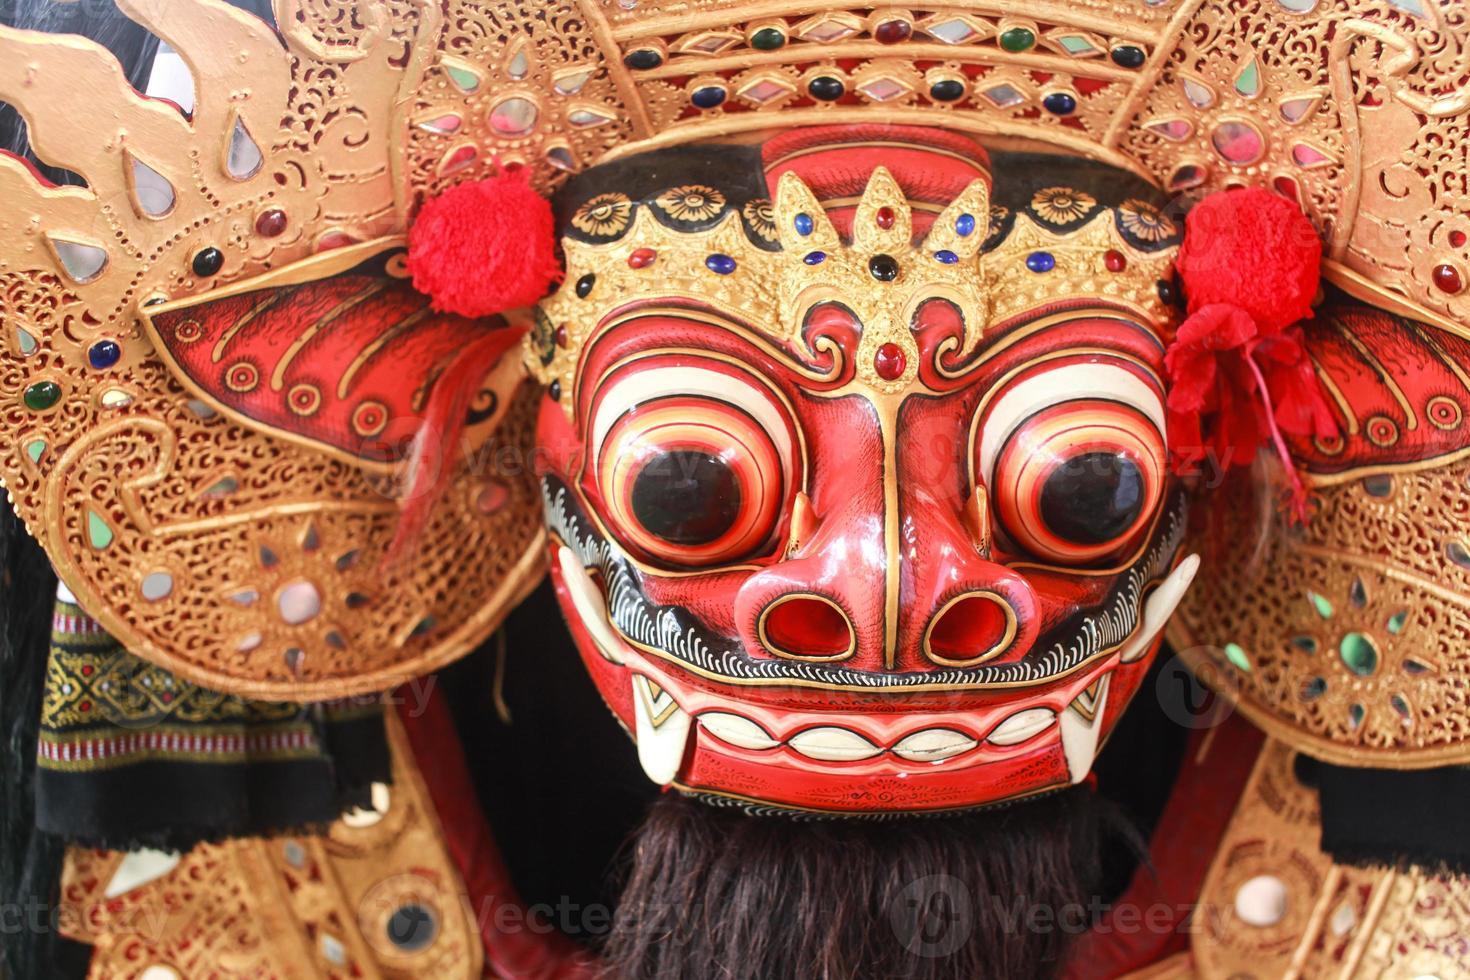 maschera barong, firma della cultura balinese foto